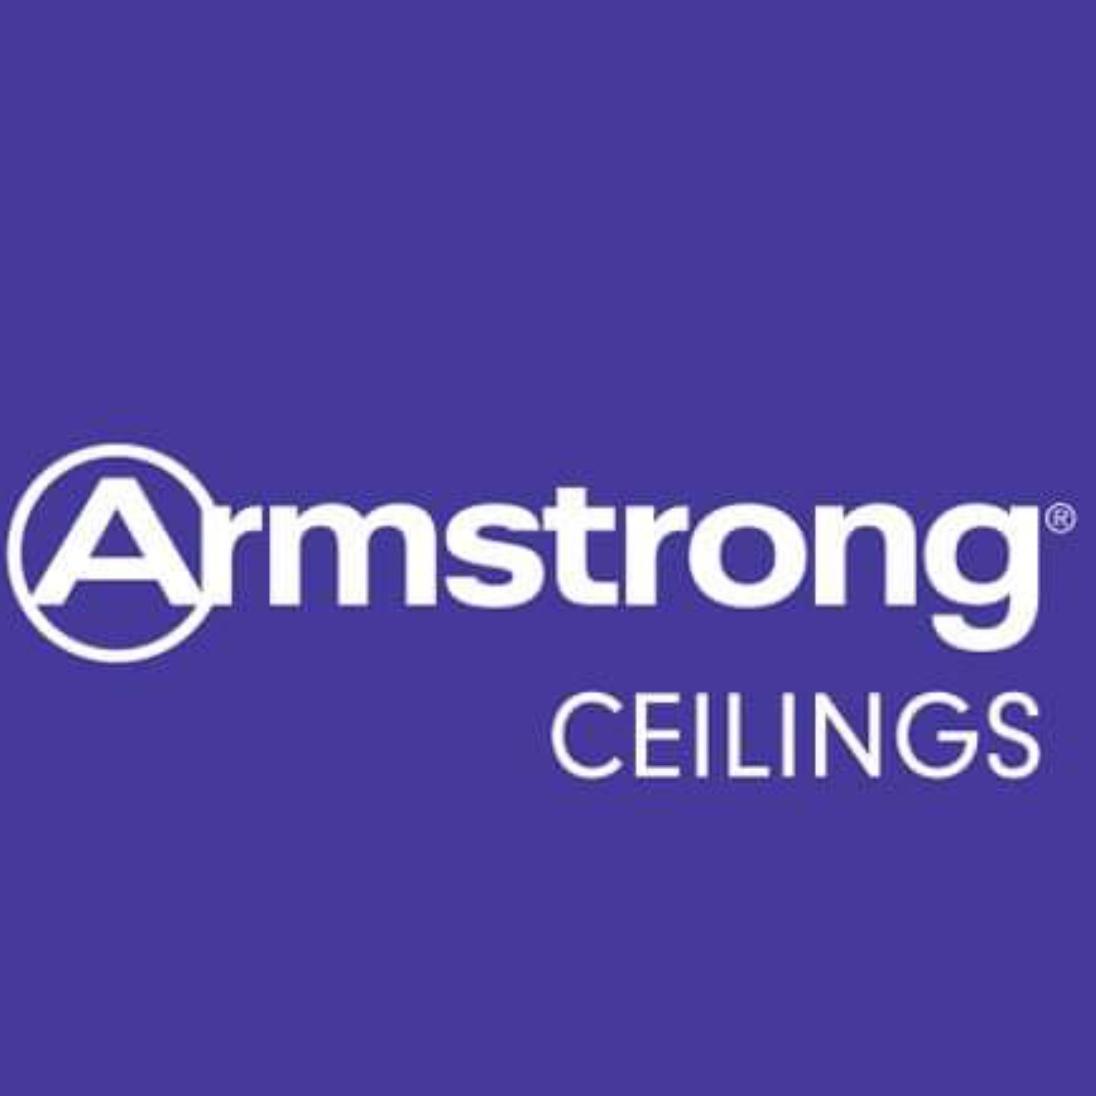 Armstrong Ceiling Tiles logo